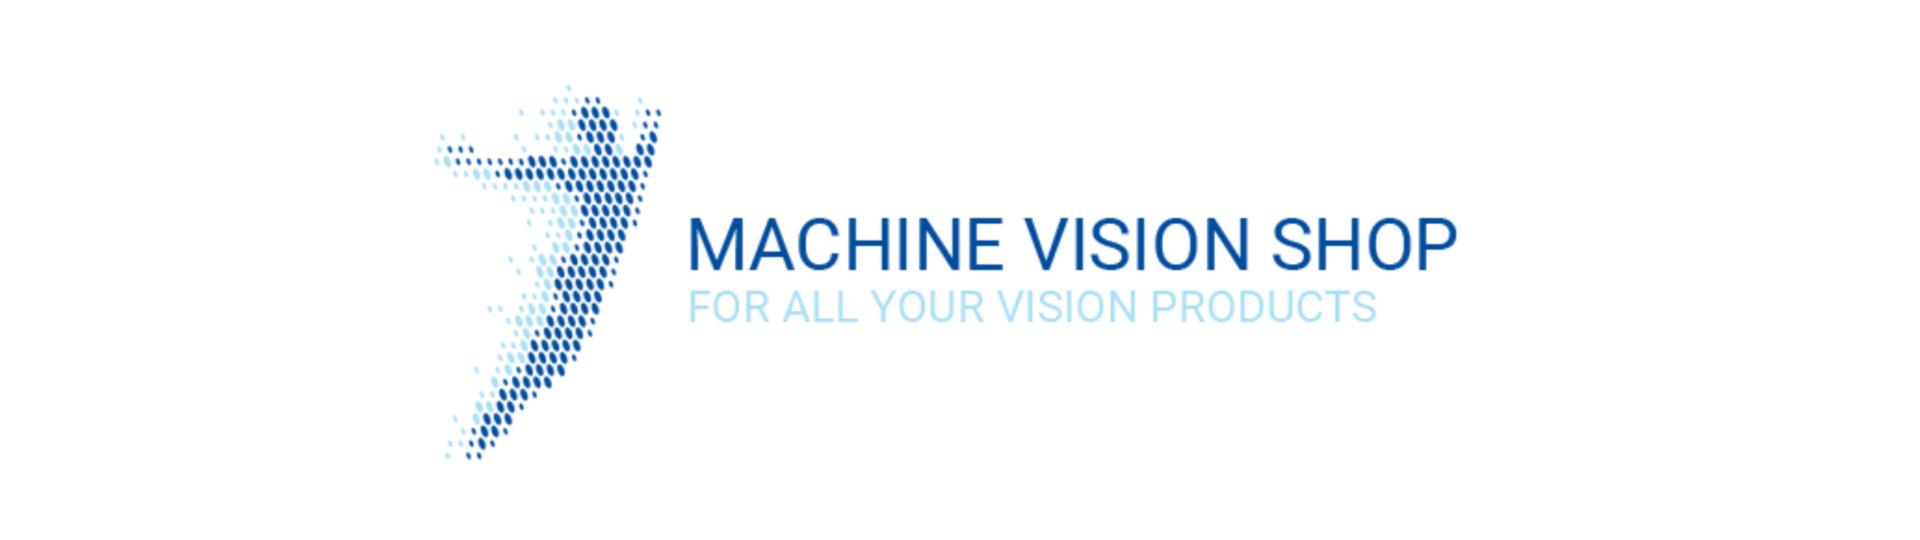 Machine Vision Shop